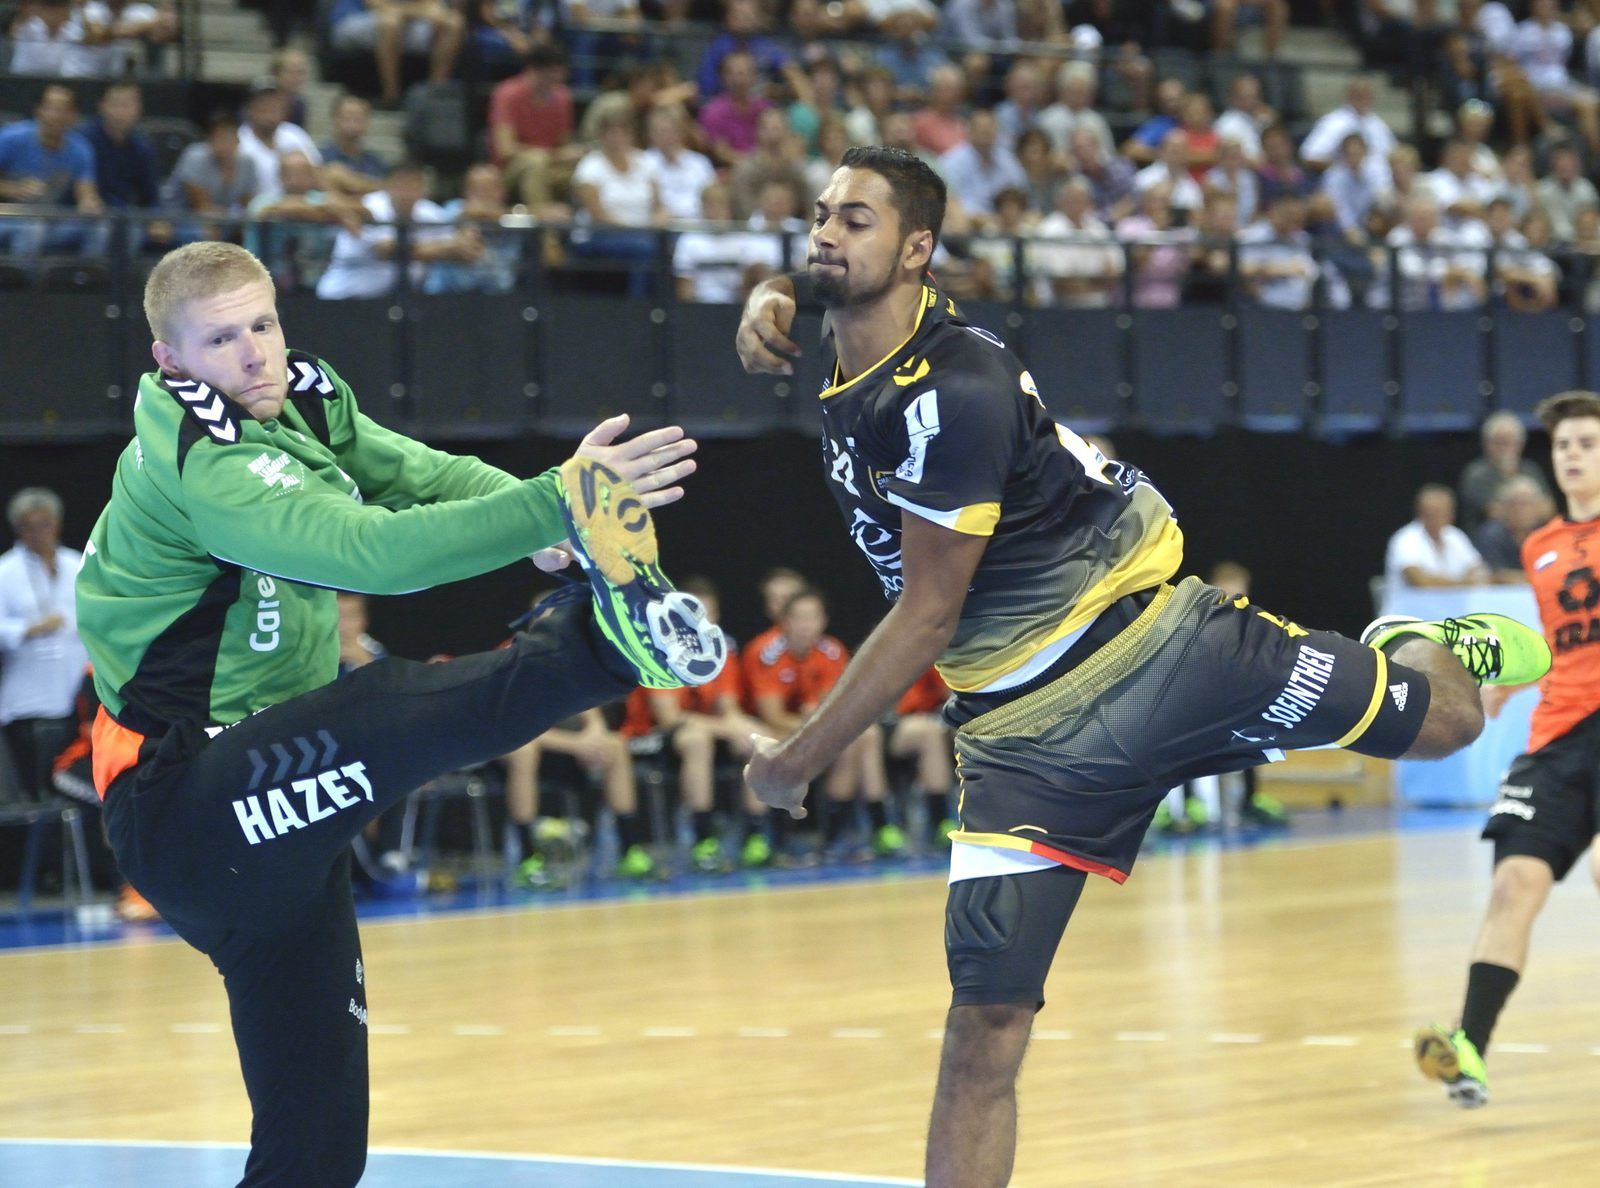 EHF/ CHAMBERY - VOLENDAM LES RECRUES FONT LEUR SHOW !